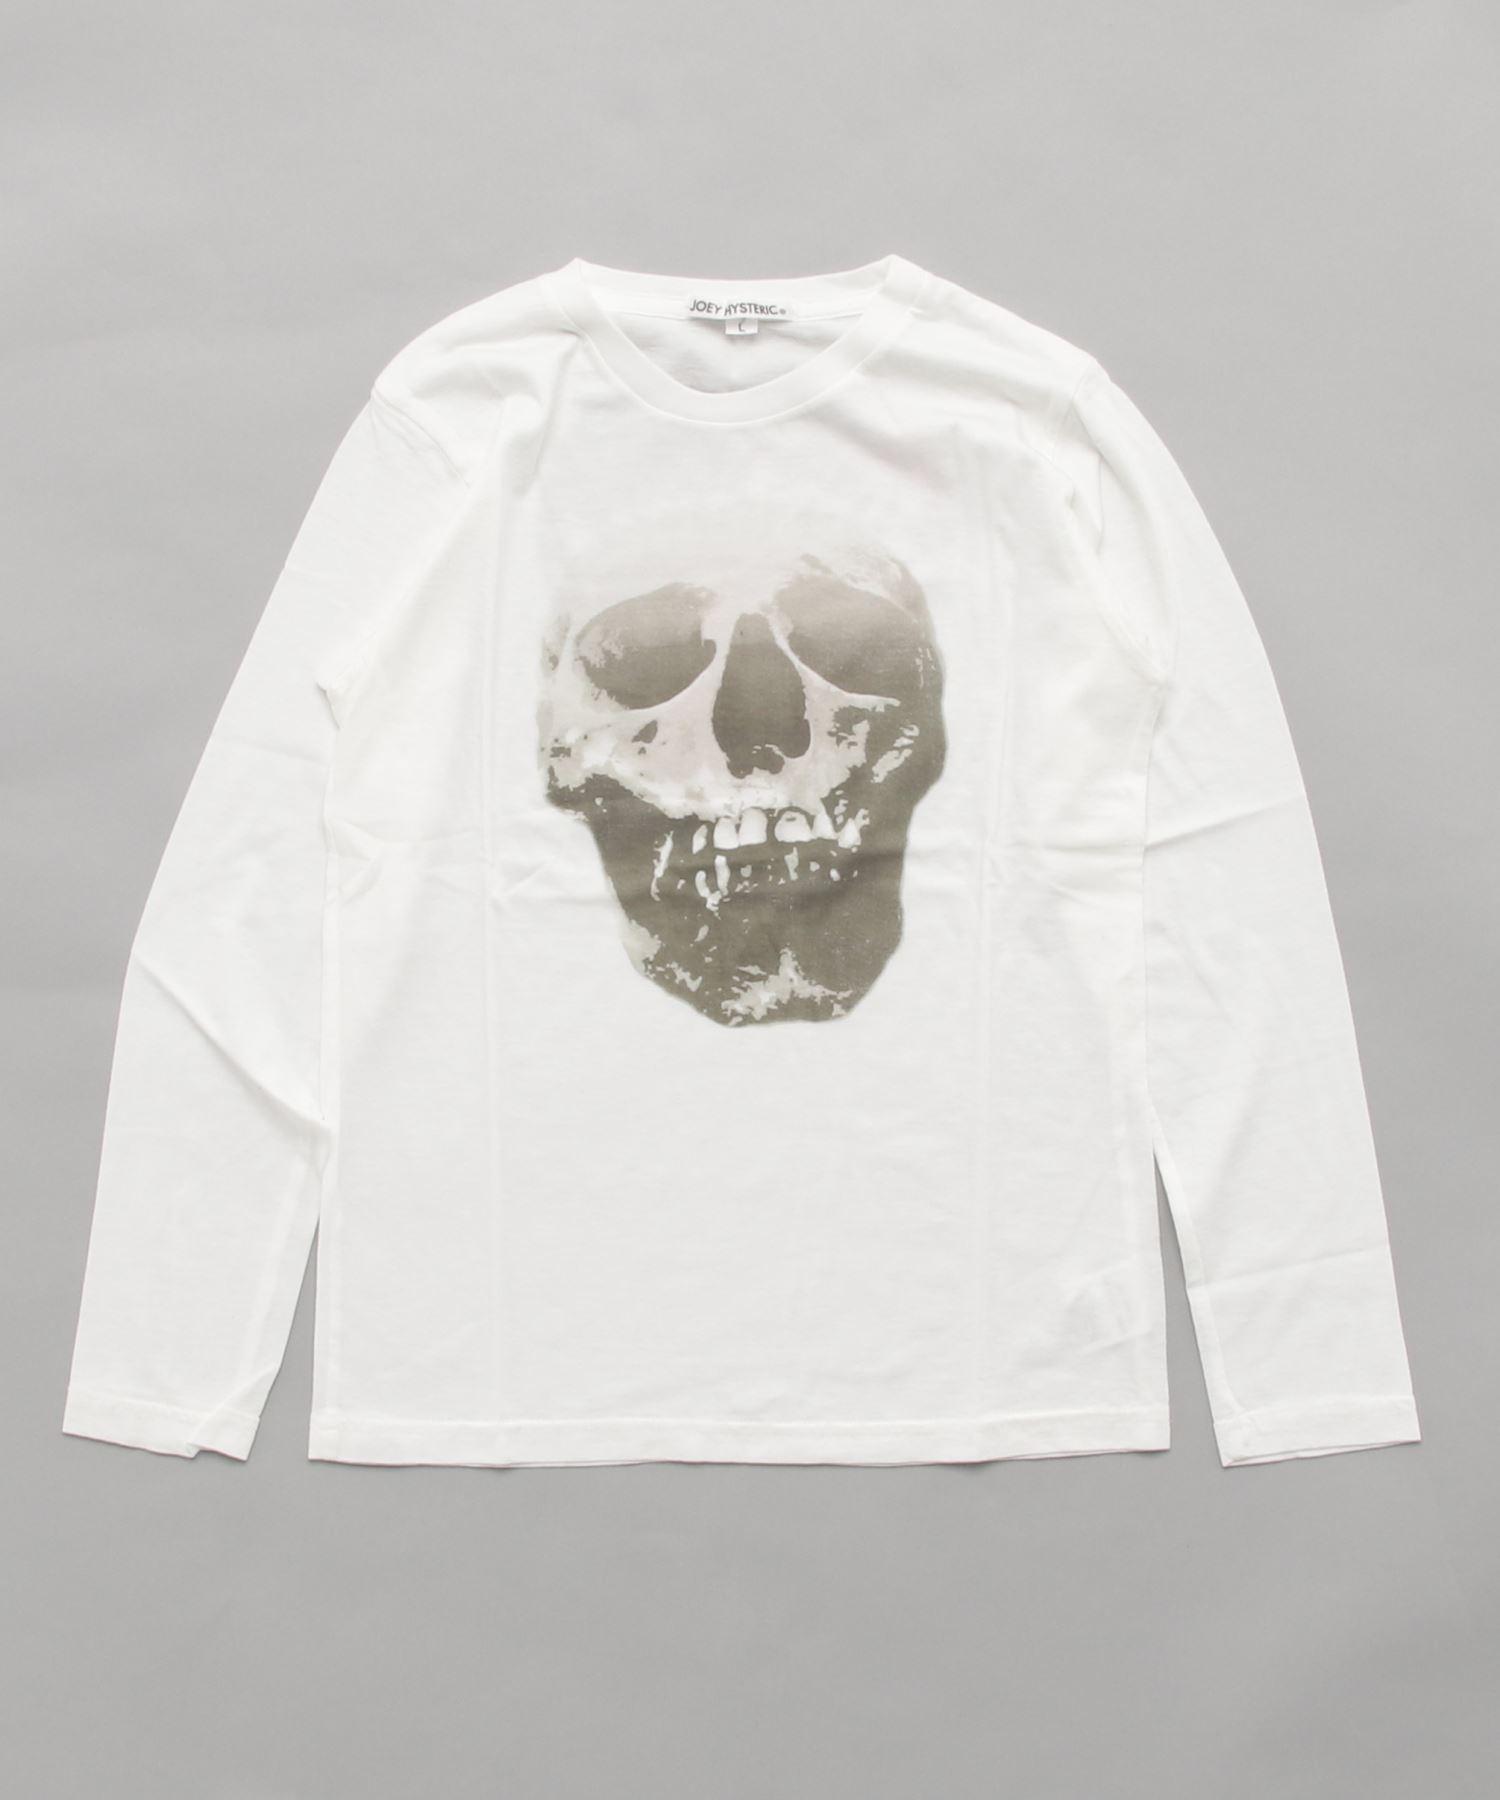 SKULL BERRY pt Tシャツ(L)